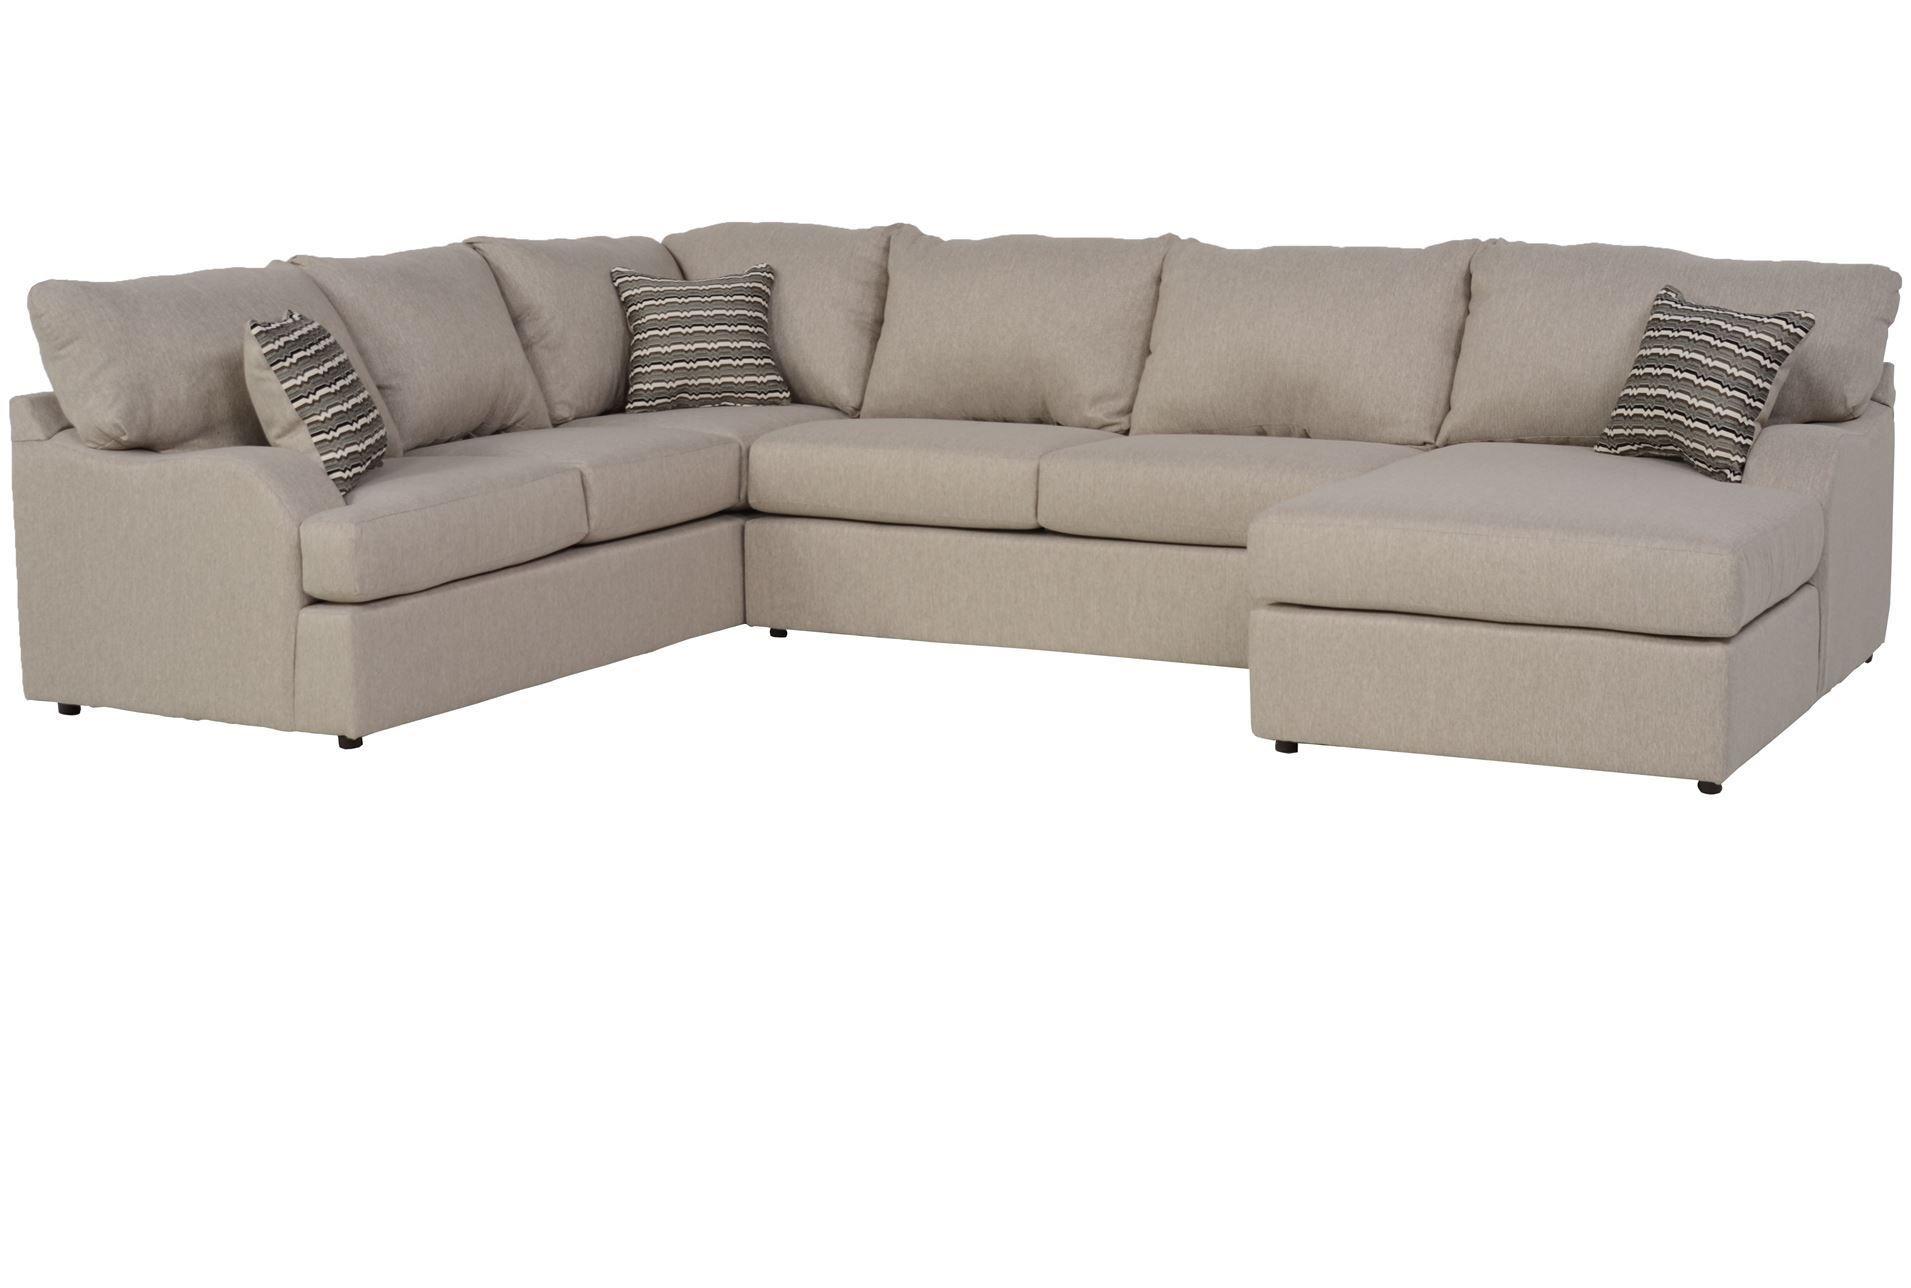 Sofa W Chaise Velvet Fabric India Meyer 3 Piece Sectional Raf Beige Sofas